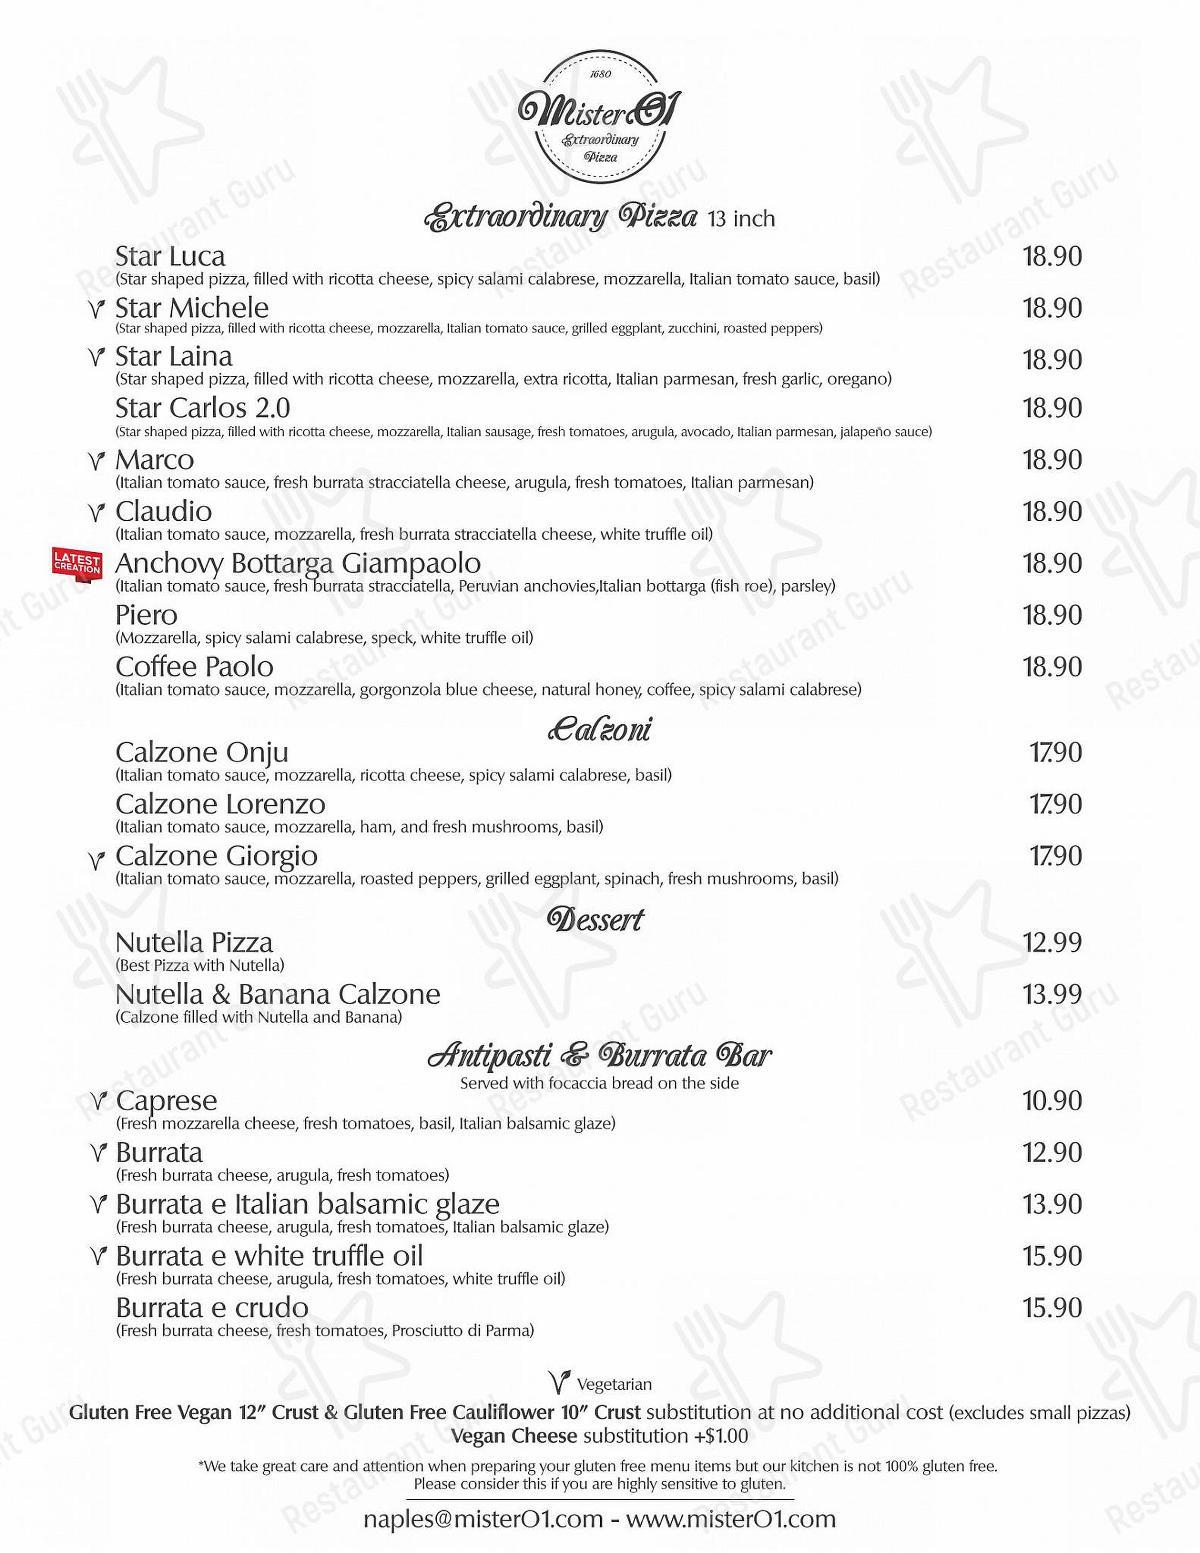 Взгляните на меню Mister O1 Extraordinary Pizza